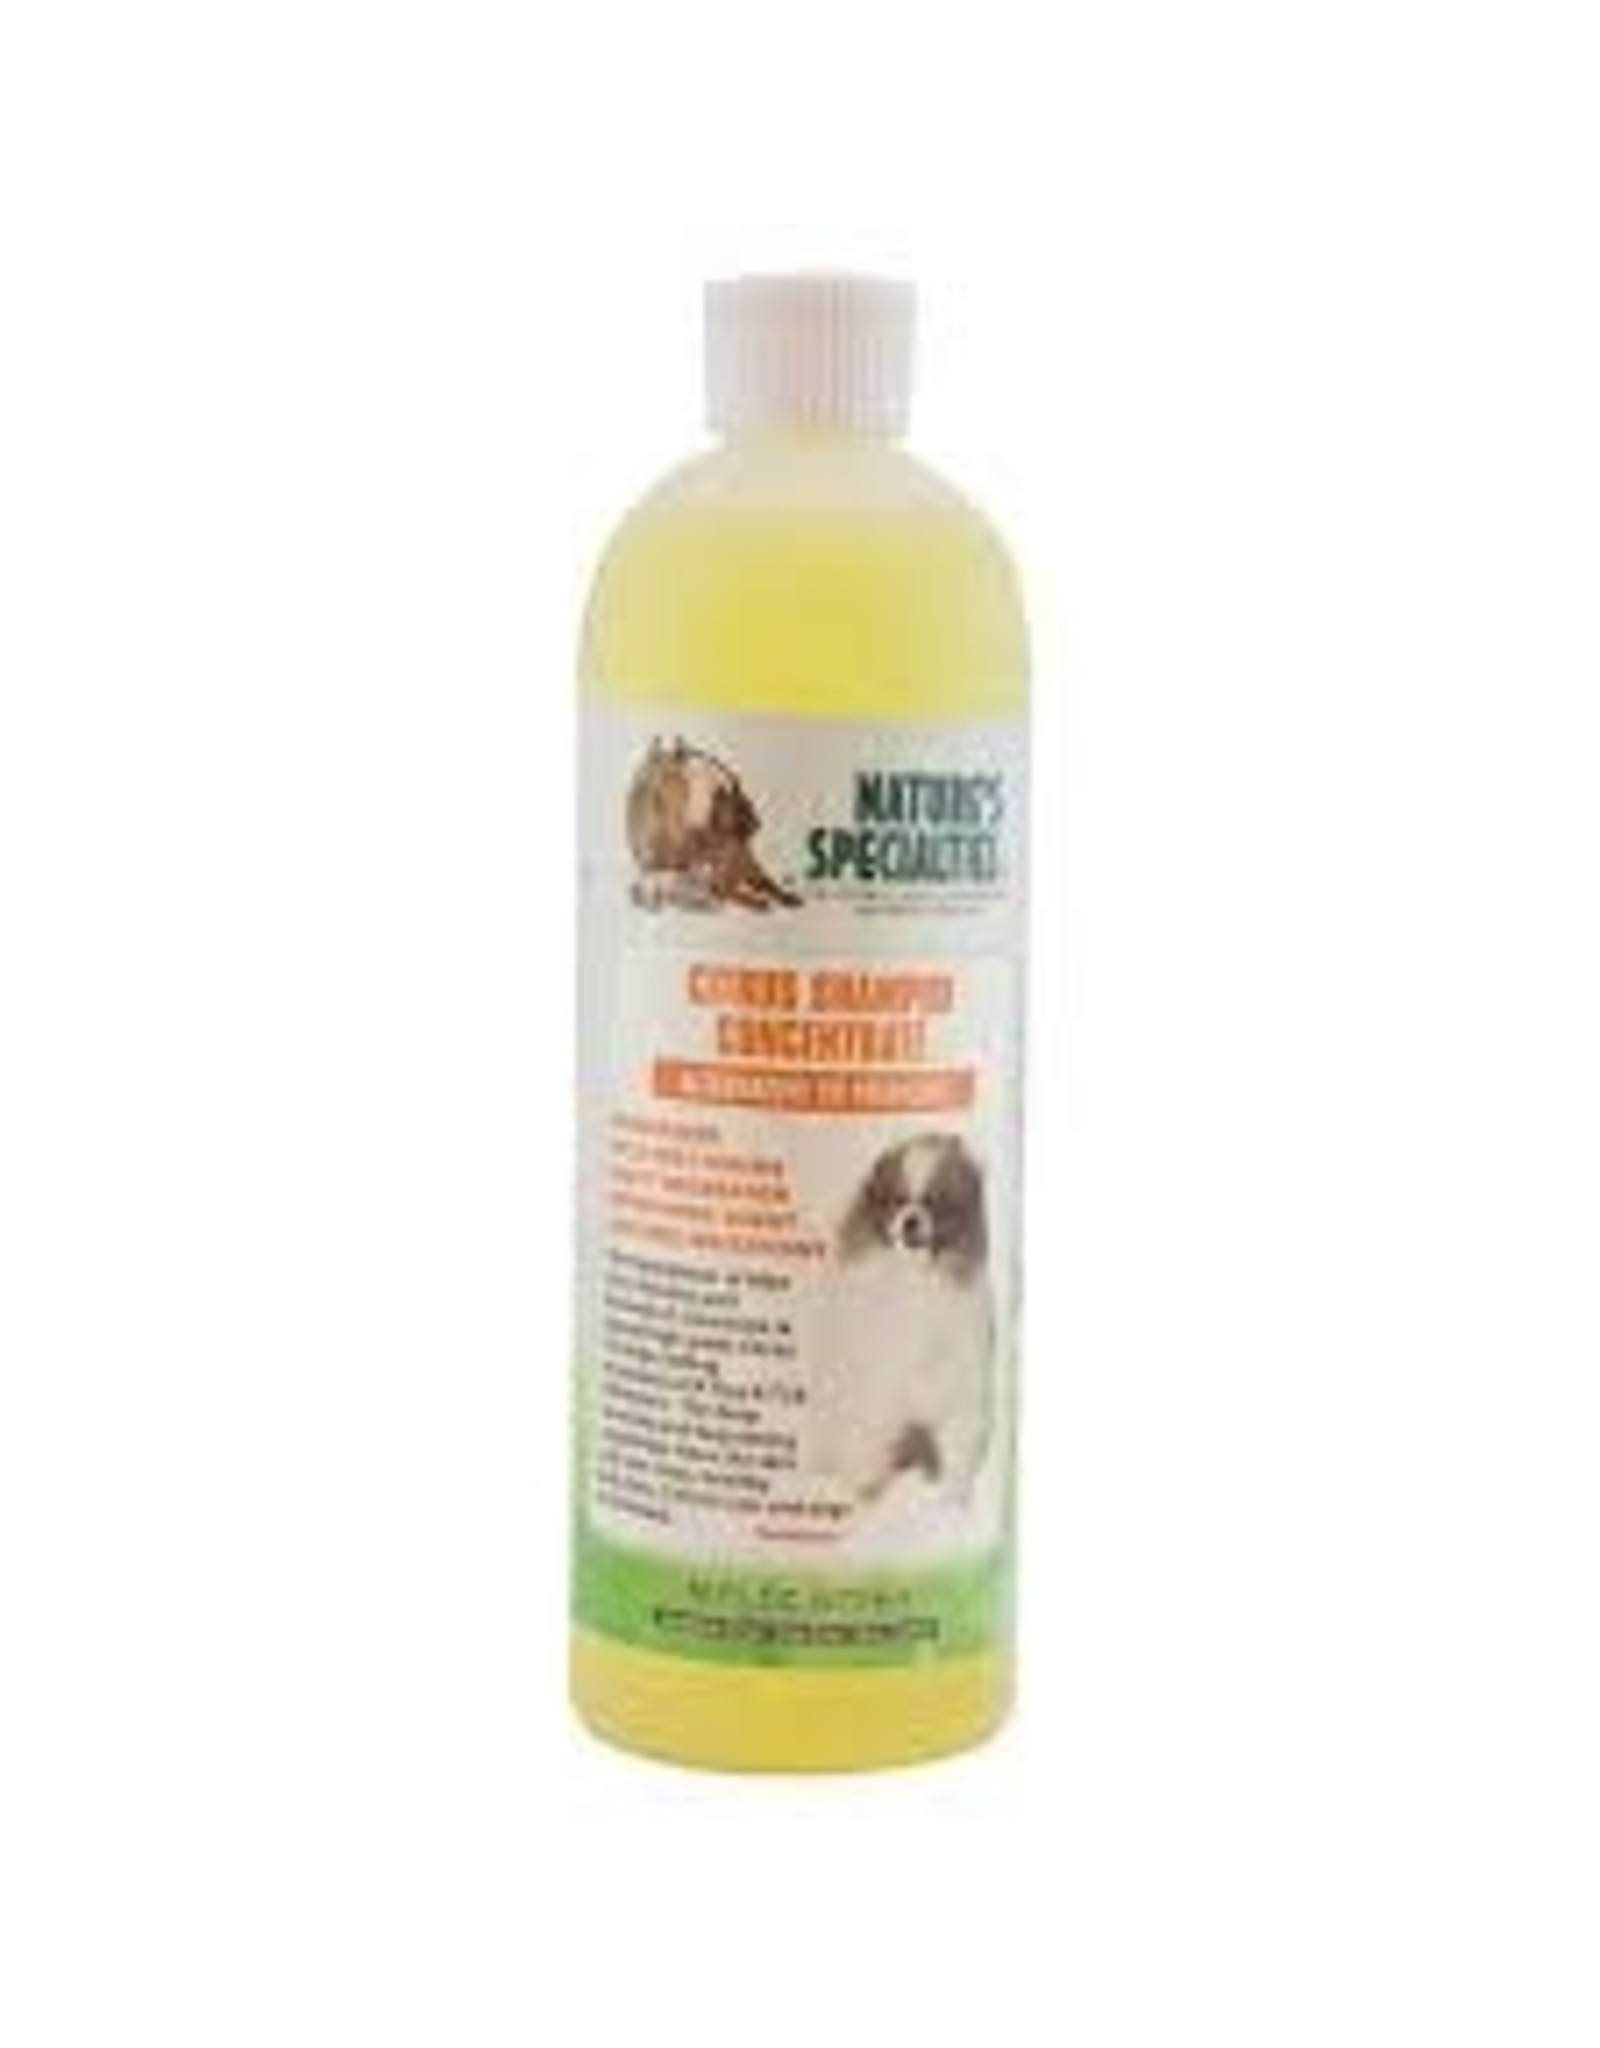 Nature's Specialty Citrus Shampoo - 16oz